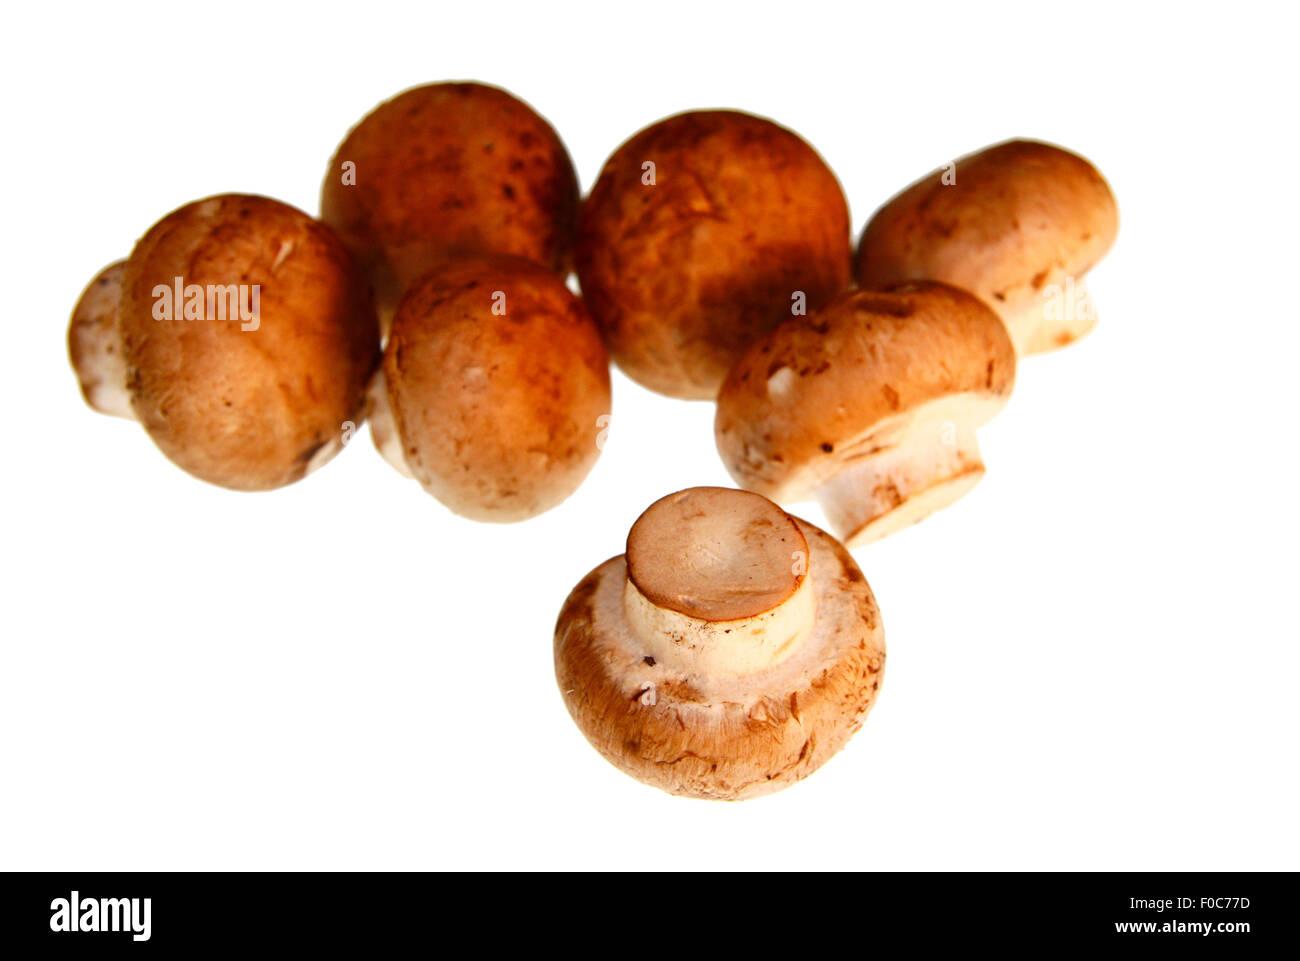 Plize: Champignons - Symbolbild Nahrungsmittel. Stock Photo